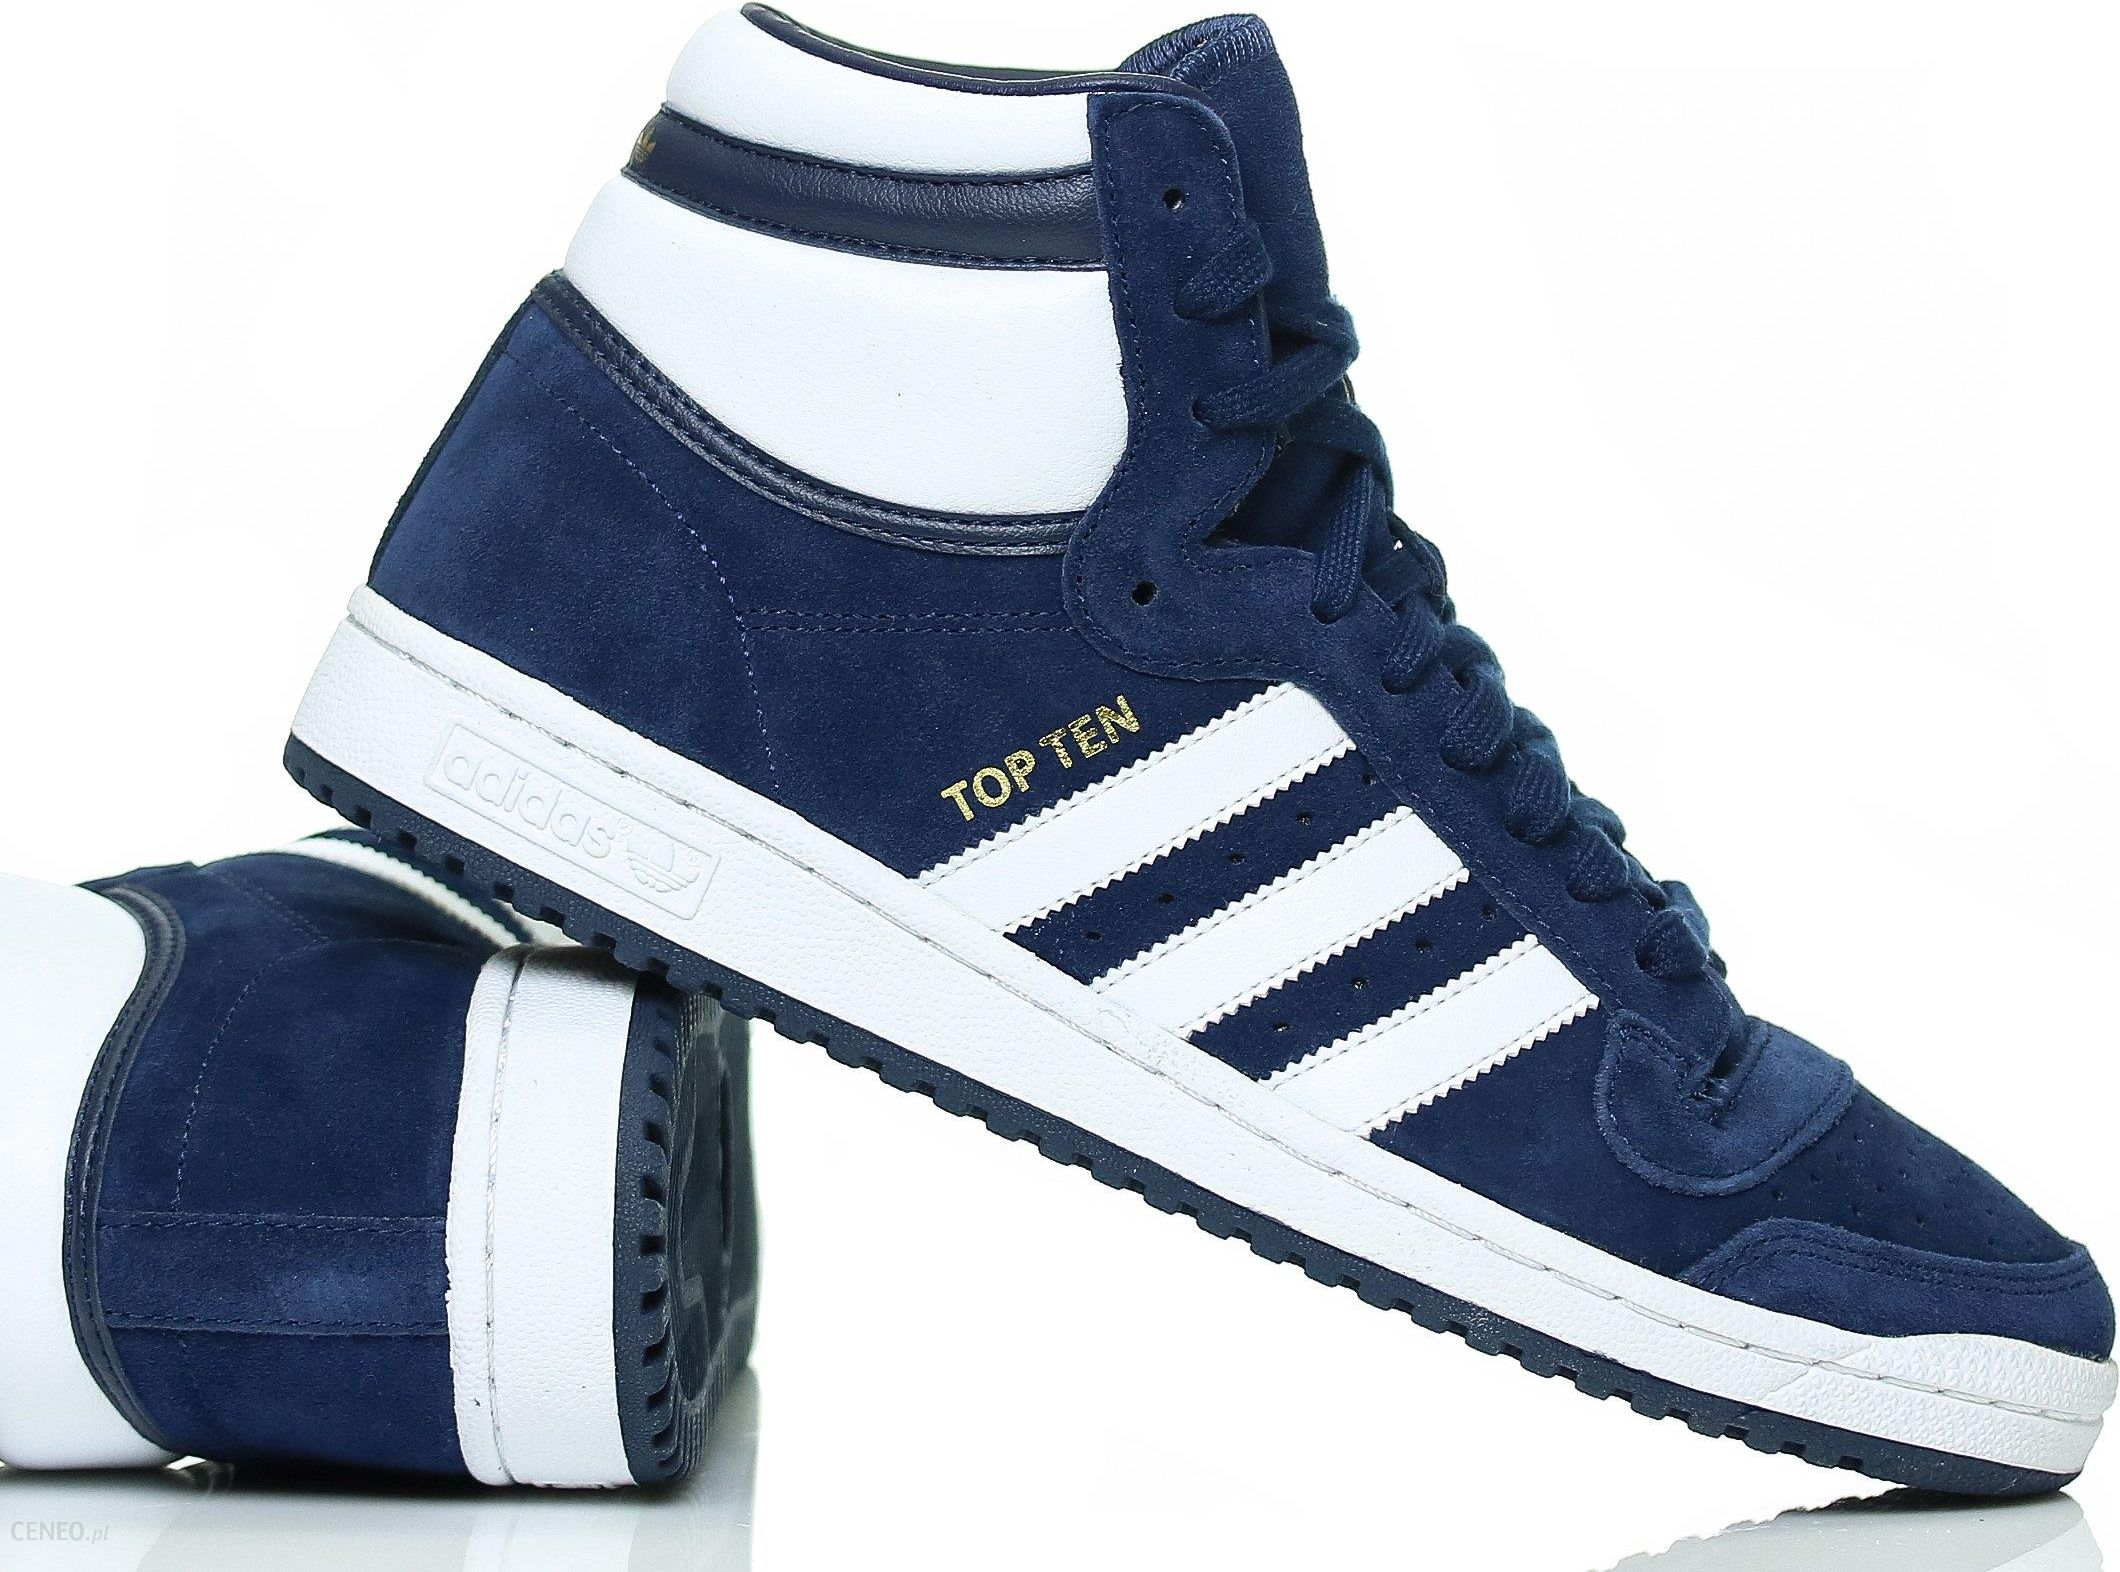 8f99afcb8cd93 Buty męskie Adidas Top Ten Hi F37661 Granatowe - Ceny i opinie ...